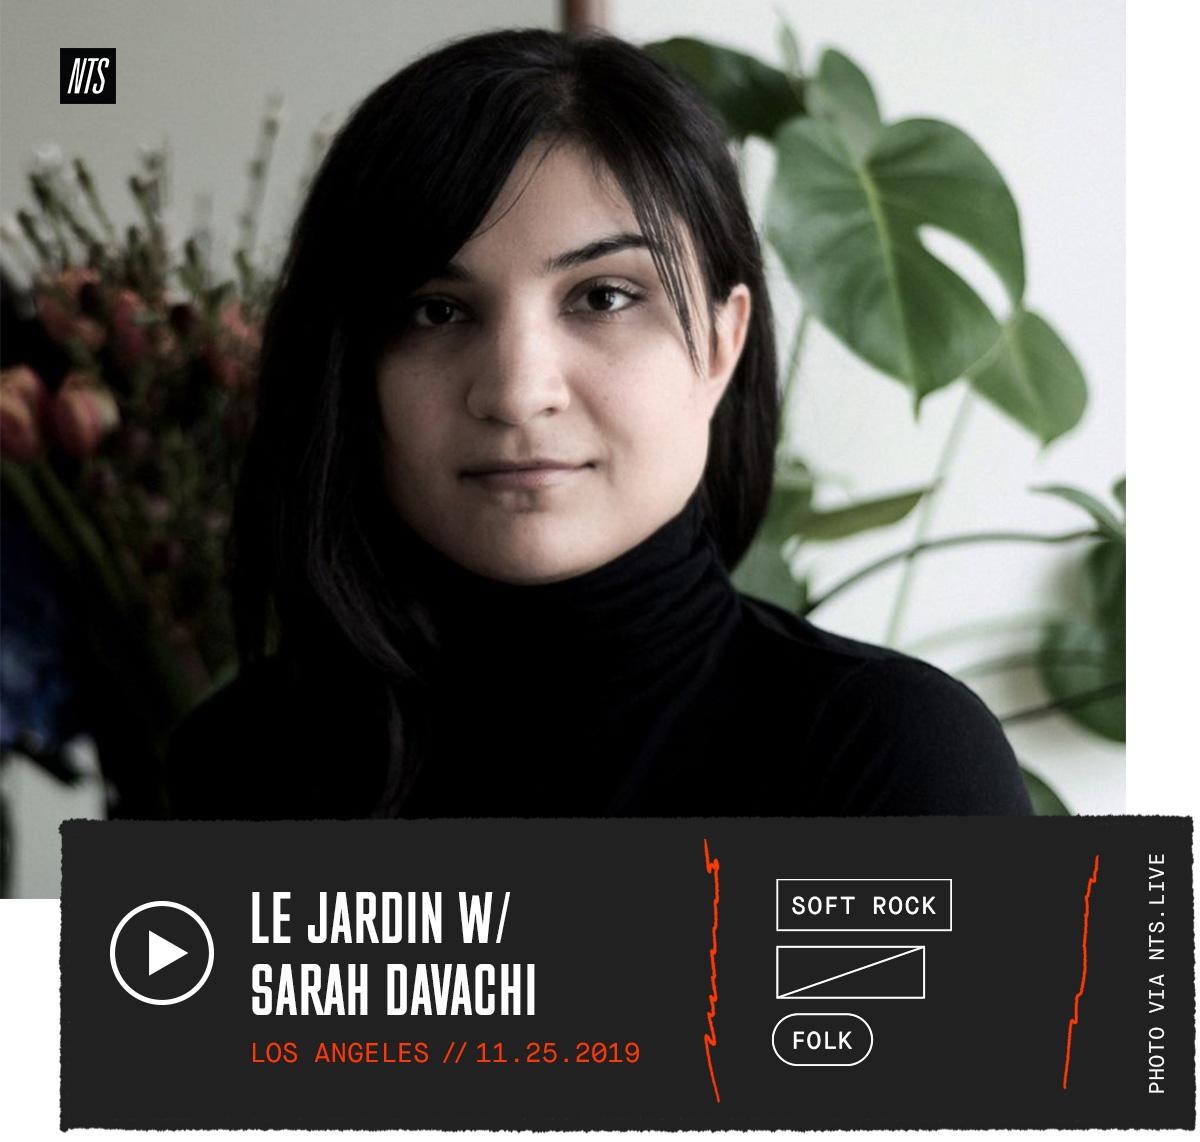 NTS Radio – LE JARDIN W/ SARAH DAVACHI